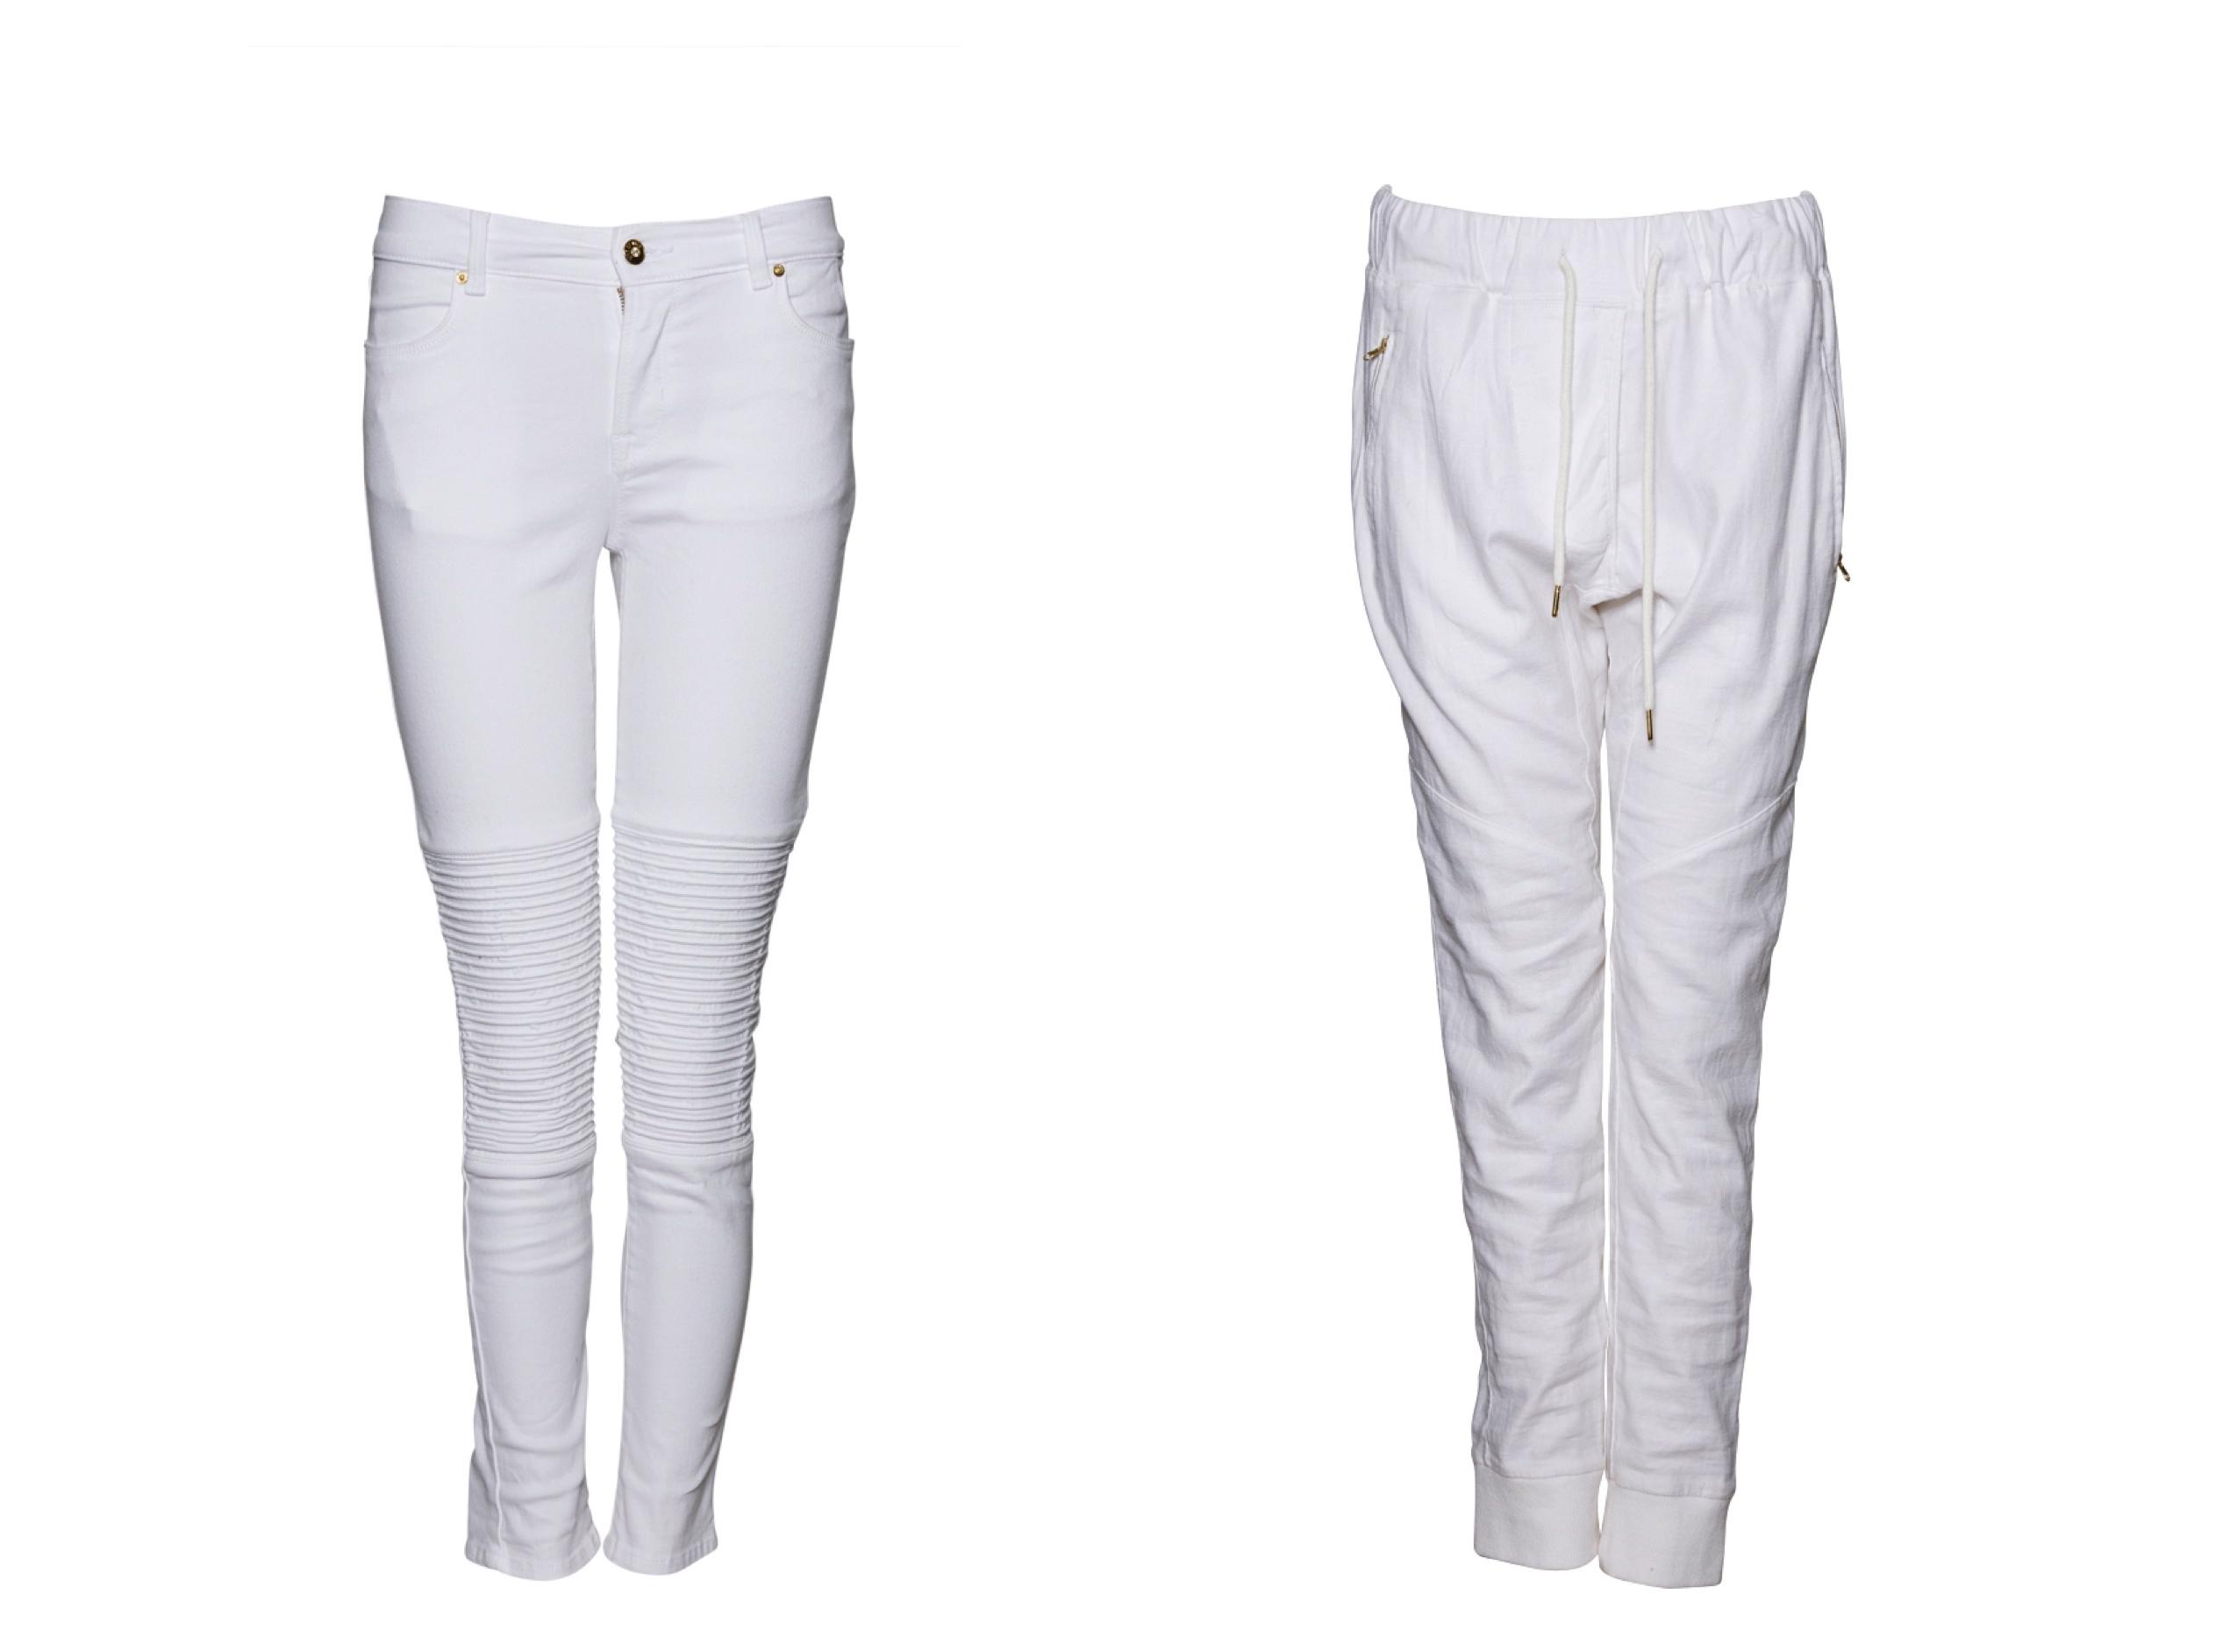 Cheap Black Khaki Pants 2017 | Pi Pants - Part 1032